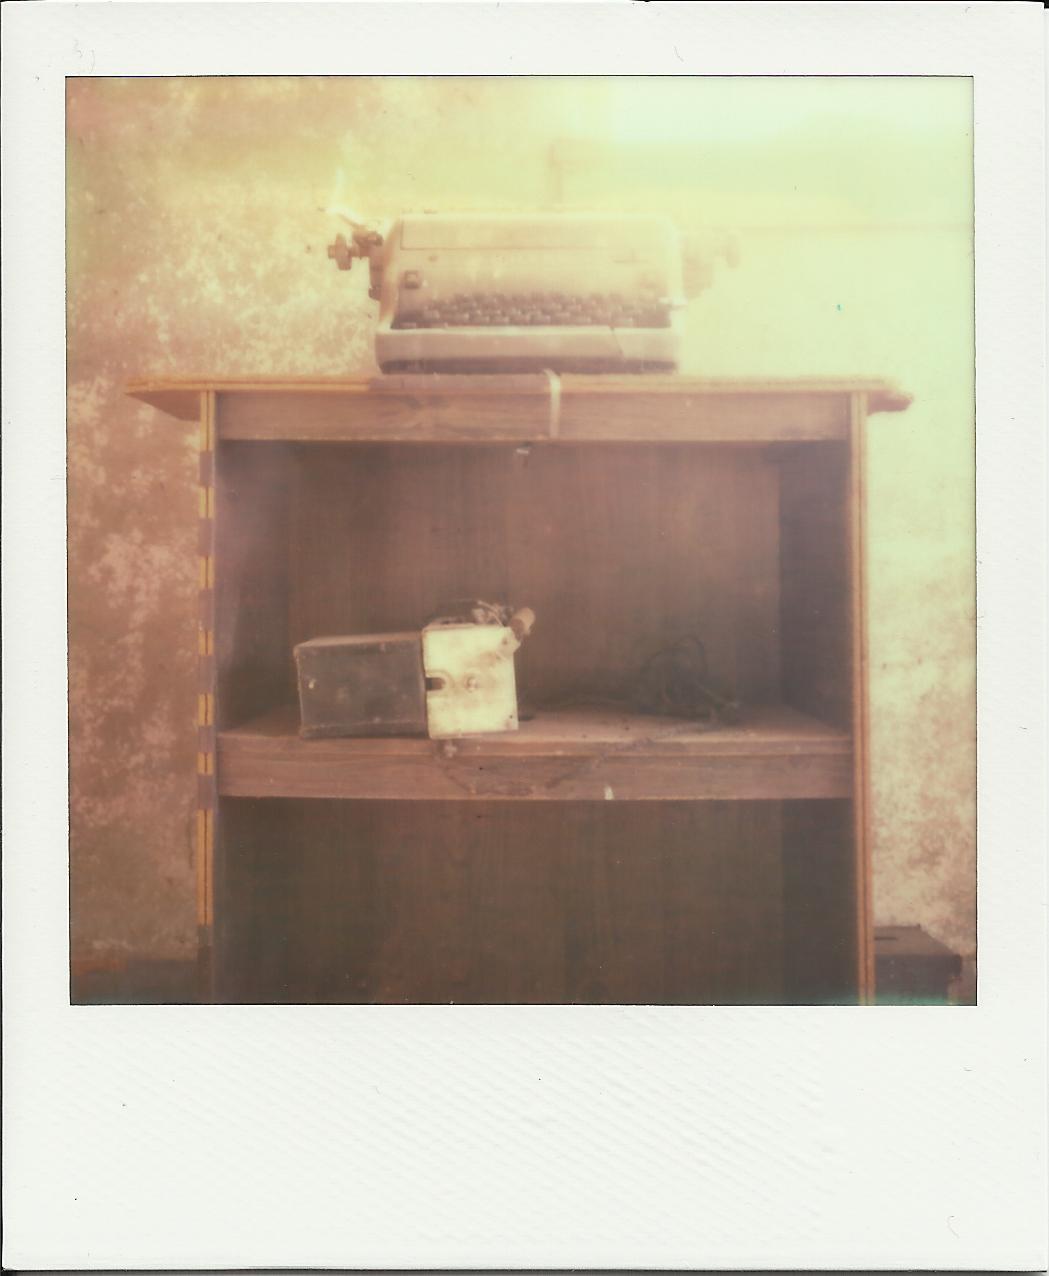 Typerwriter2.1 Polaroid.jpg